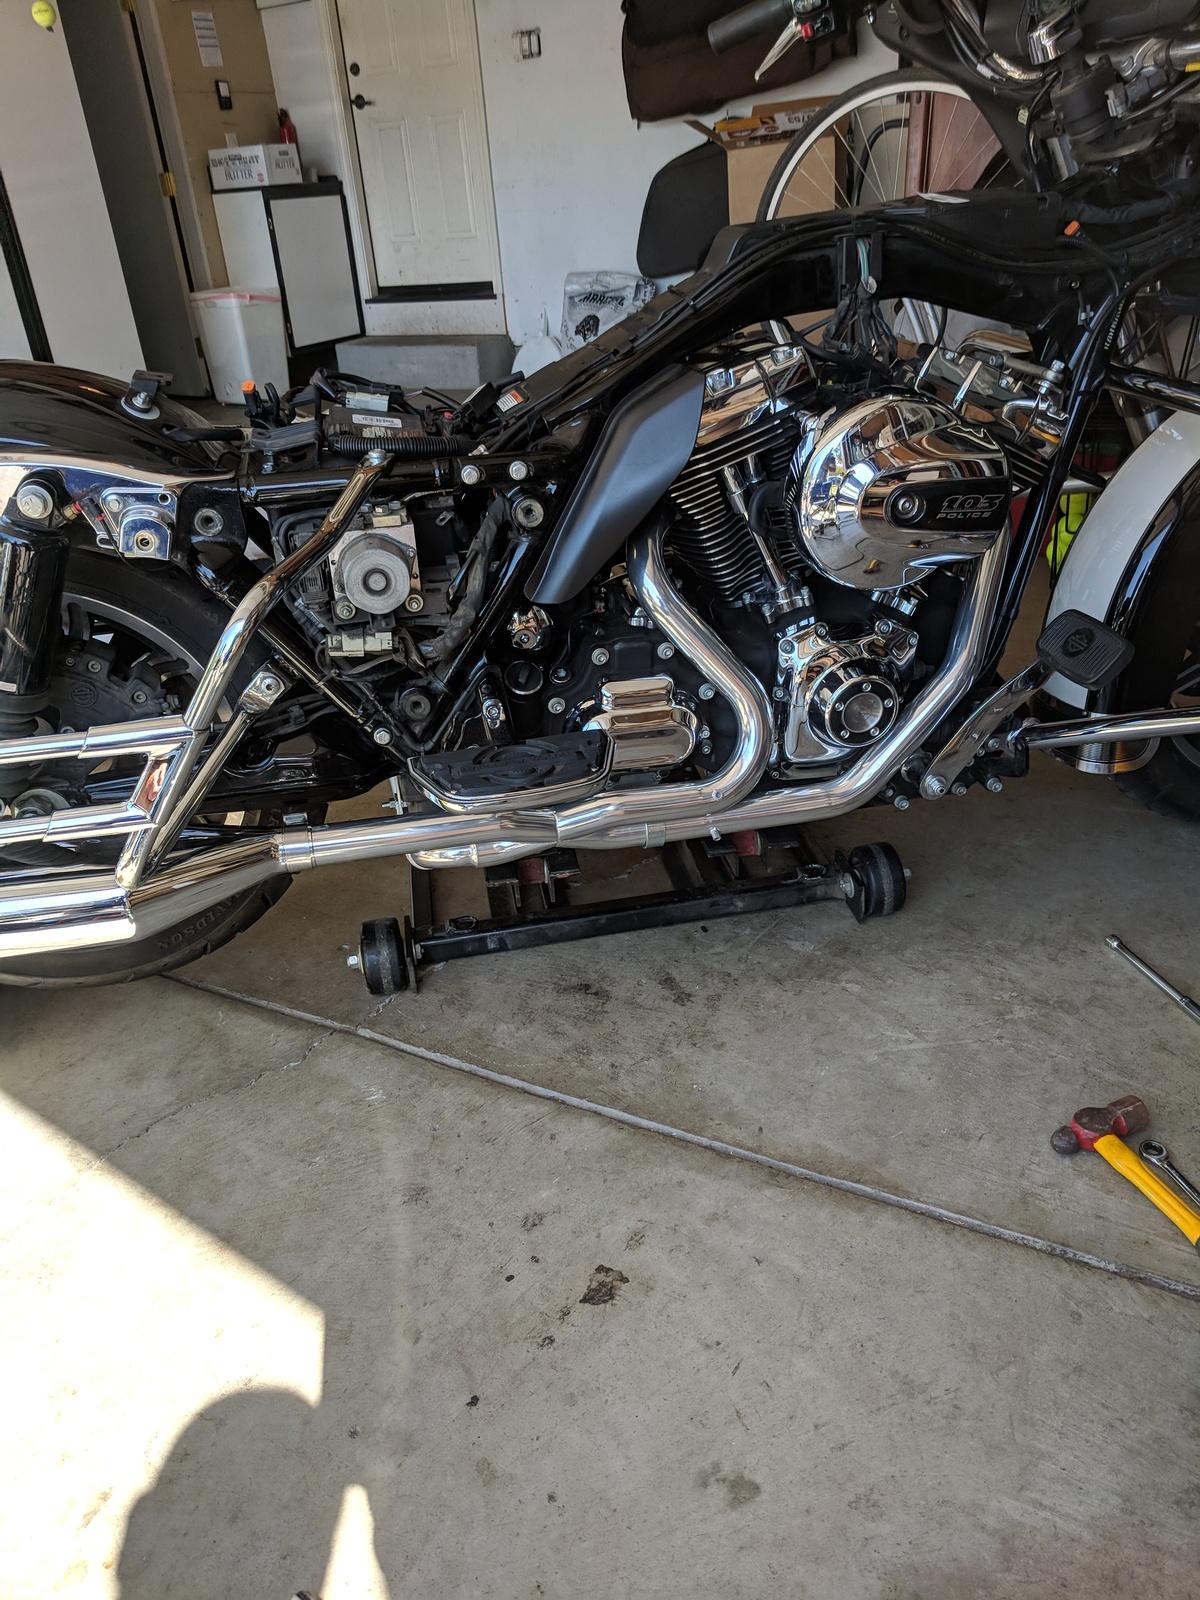 Doug's Harley After